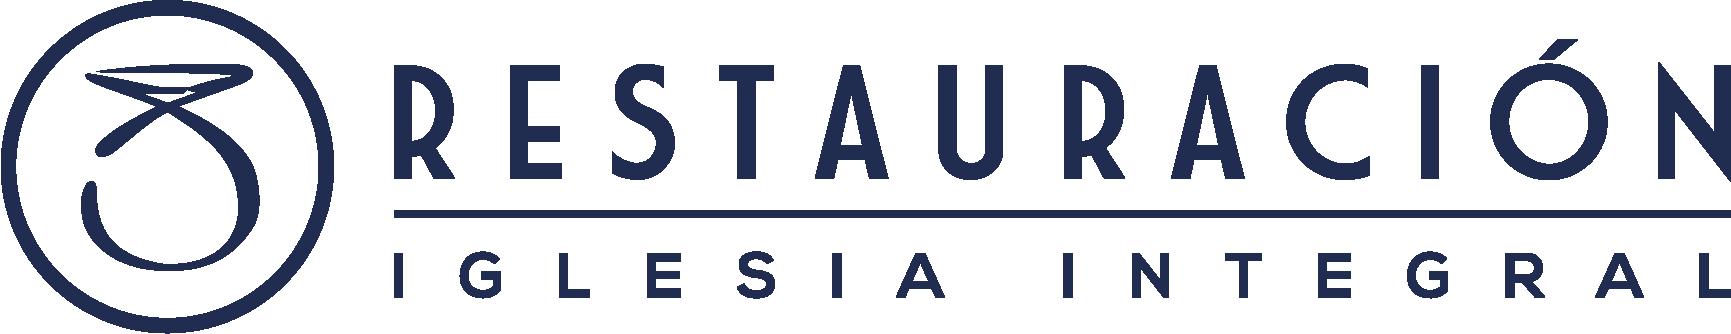 Iglesia Integral de Restauracion